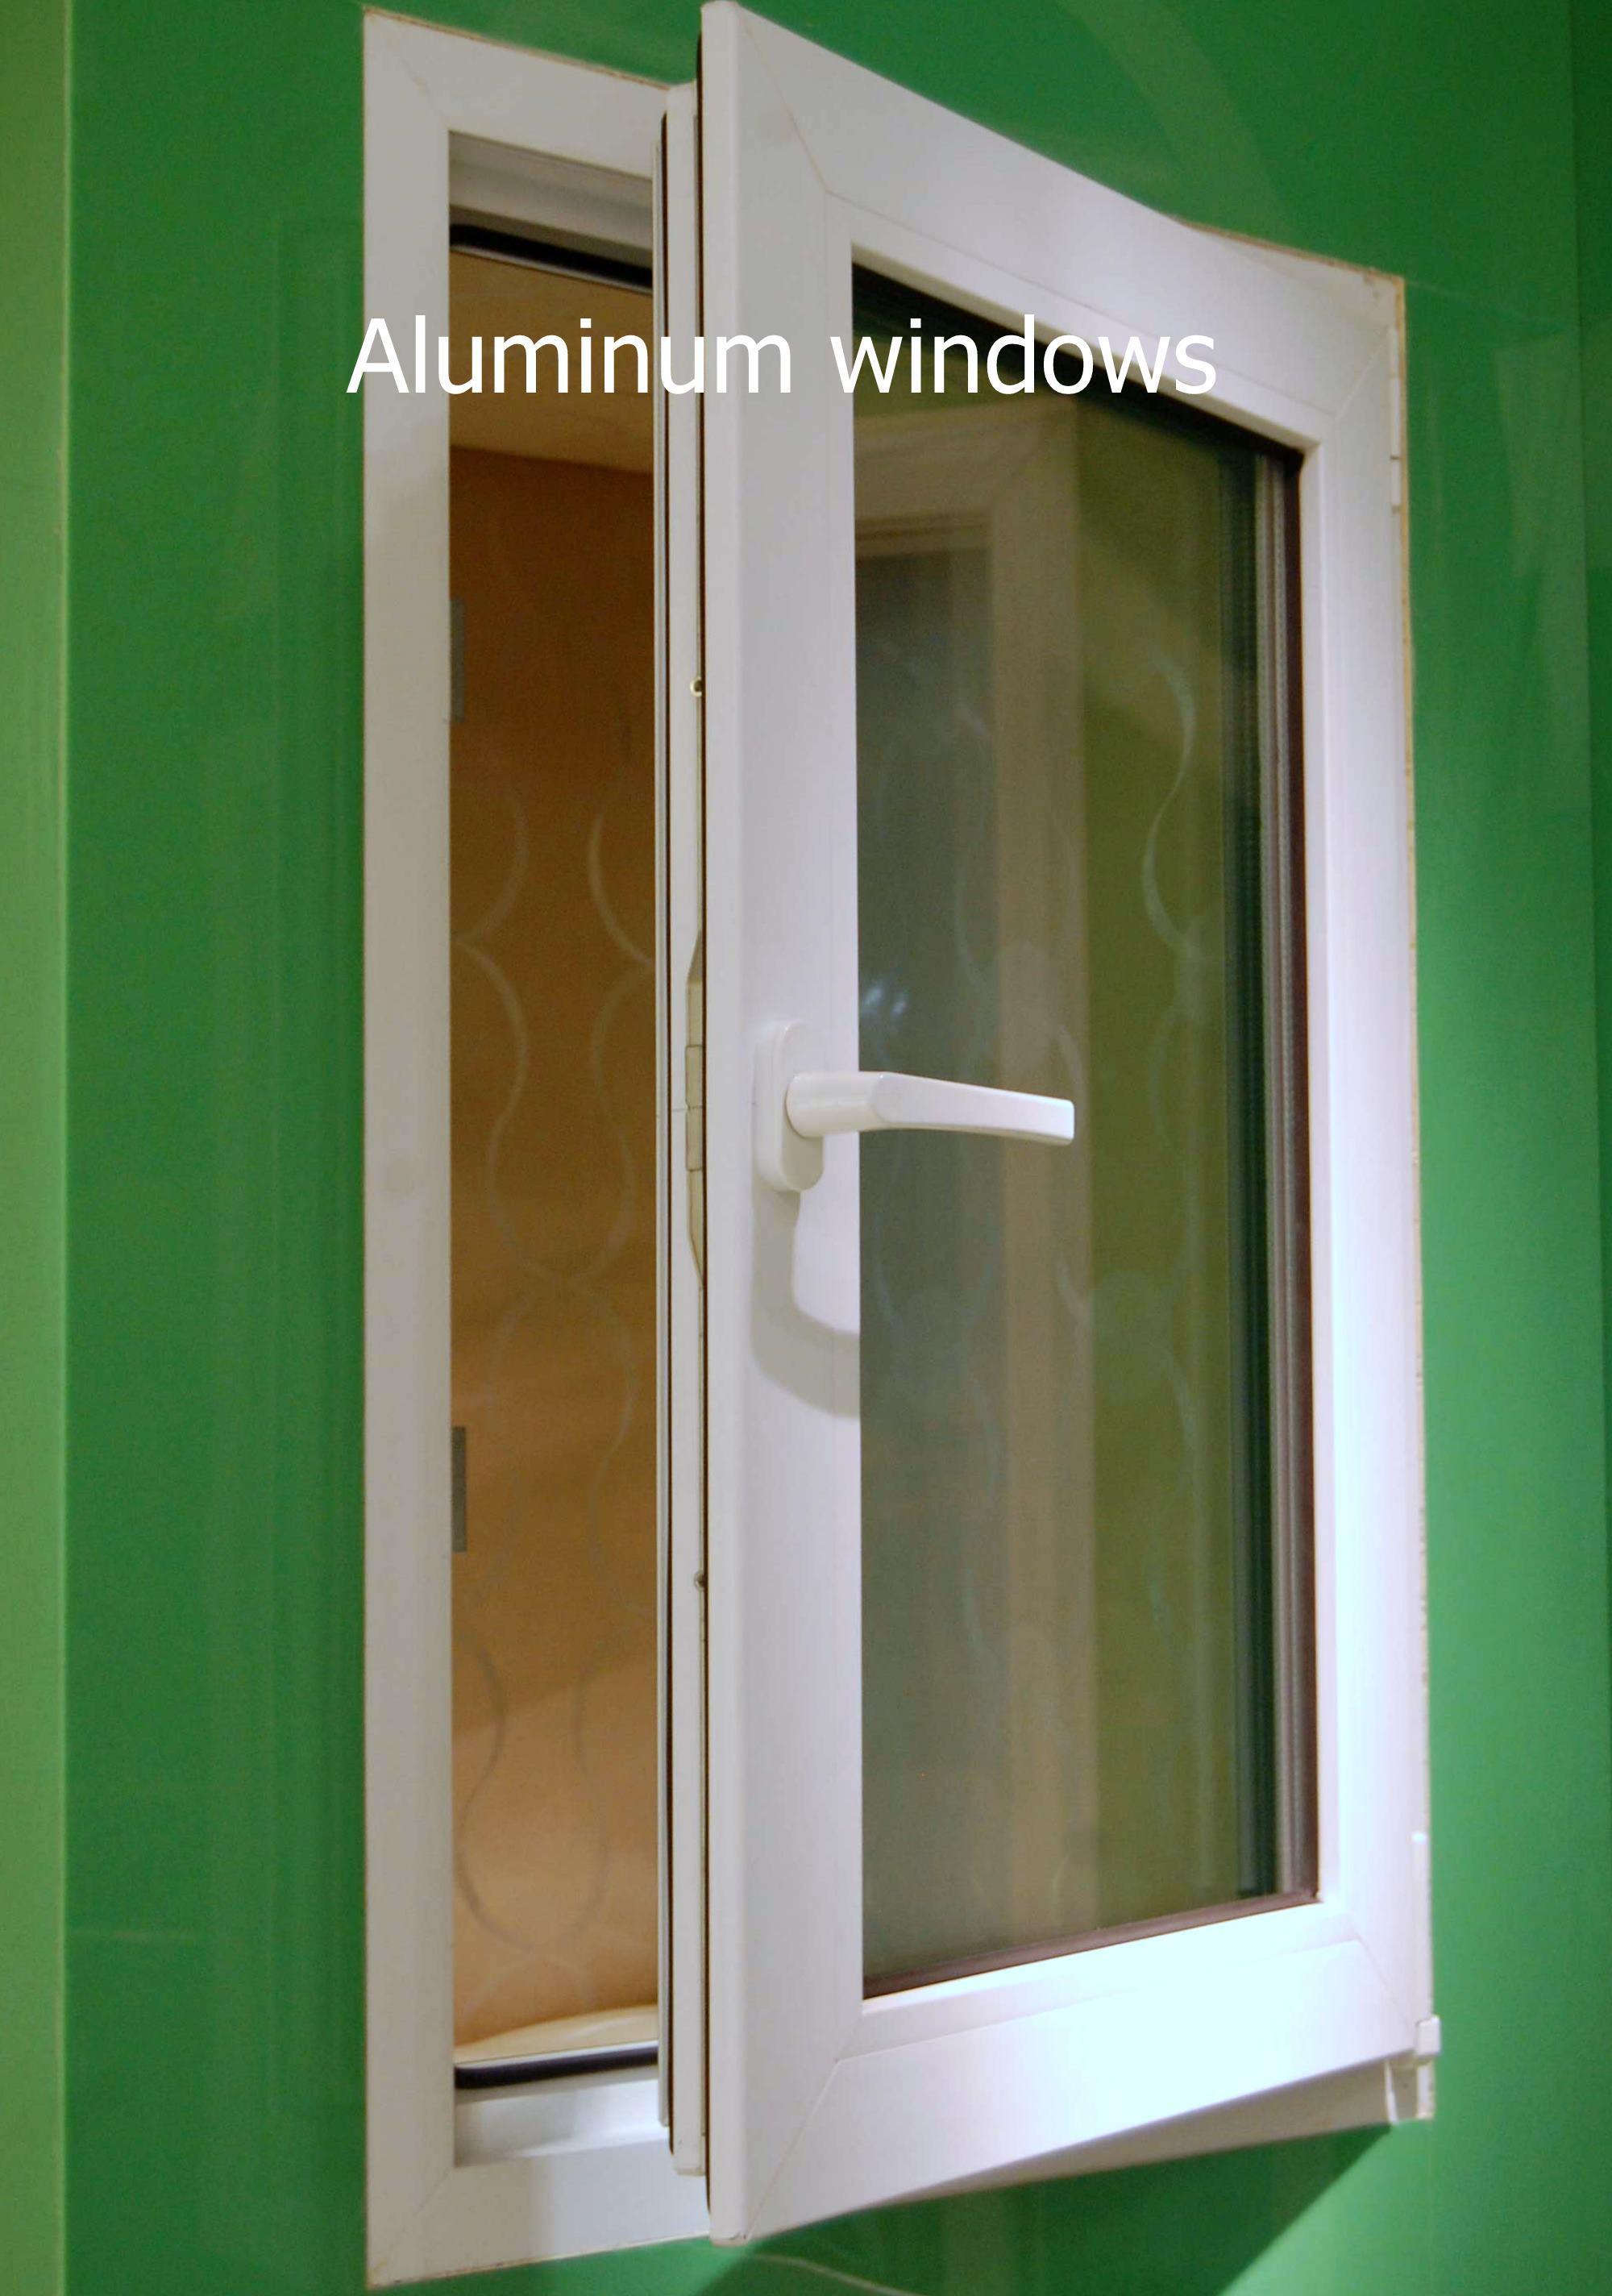 Single casement windows - Import Aluminium Single Style Casement Windows